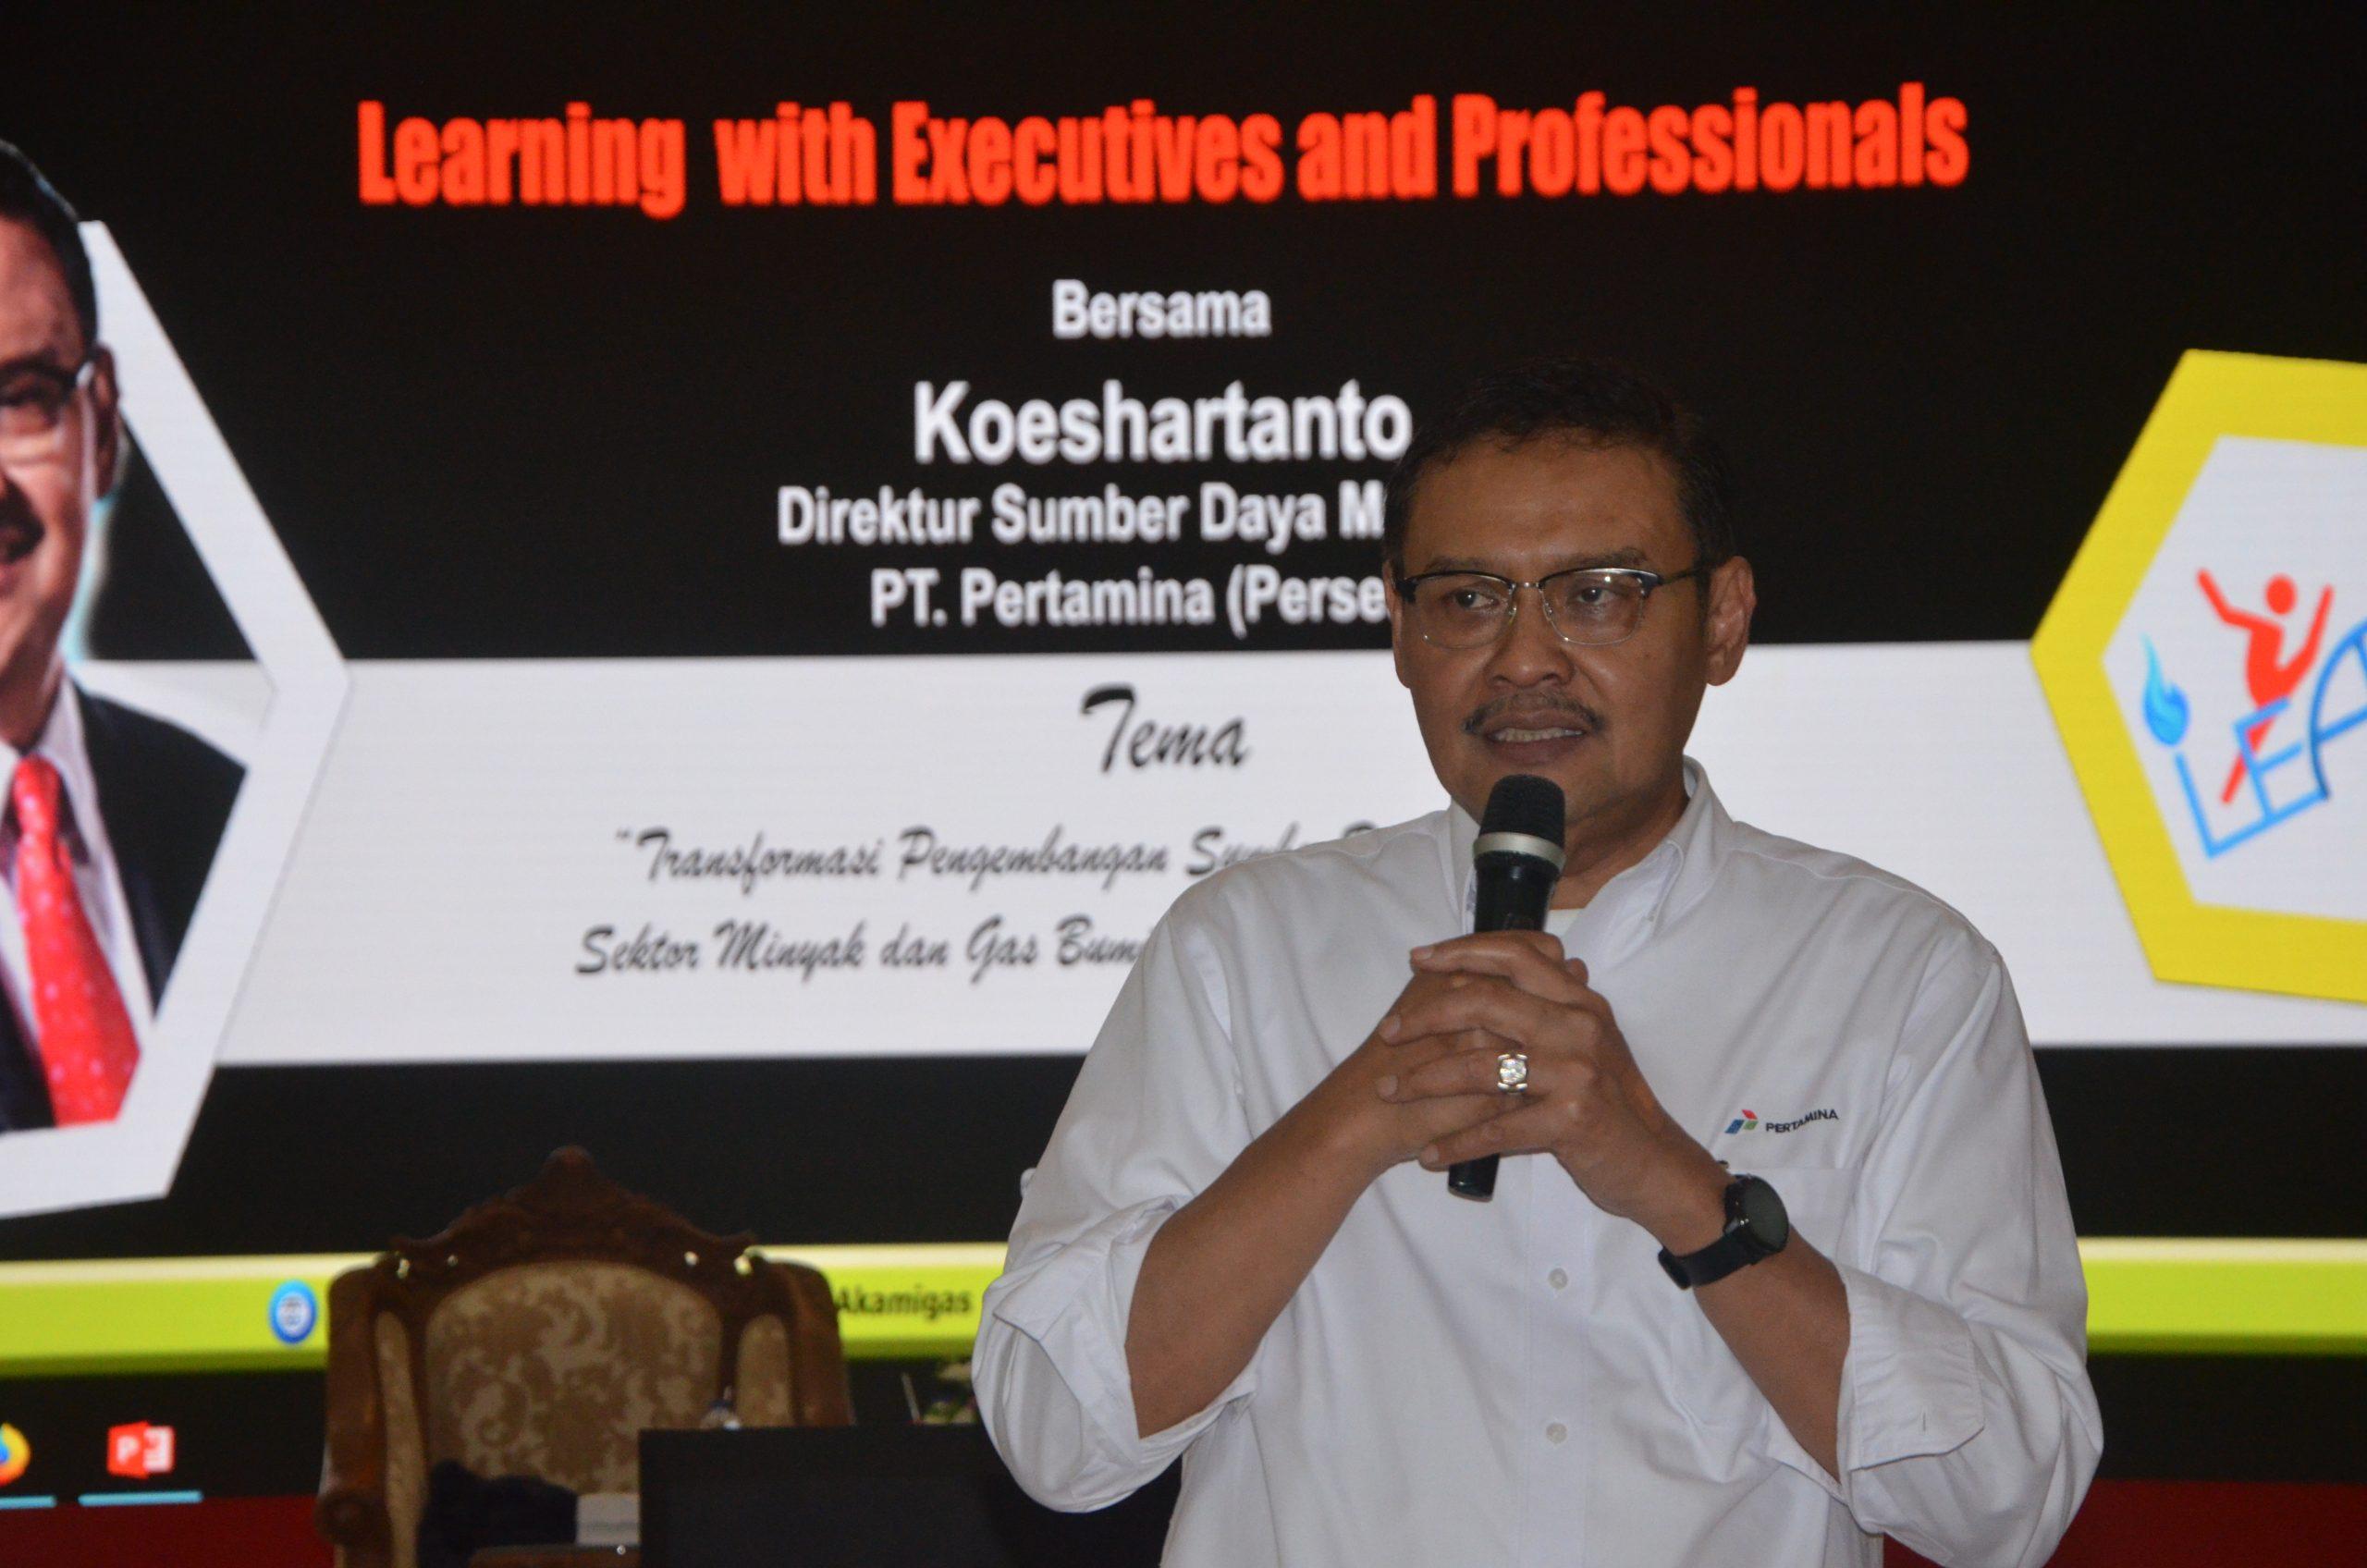 Learning With Executives And Professionals Bersama Koshartanto dari PT Pertamina, Agustus 2019